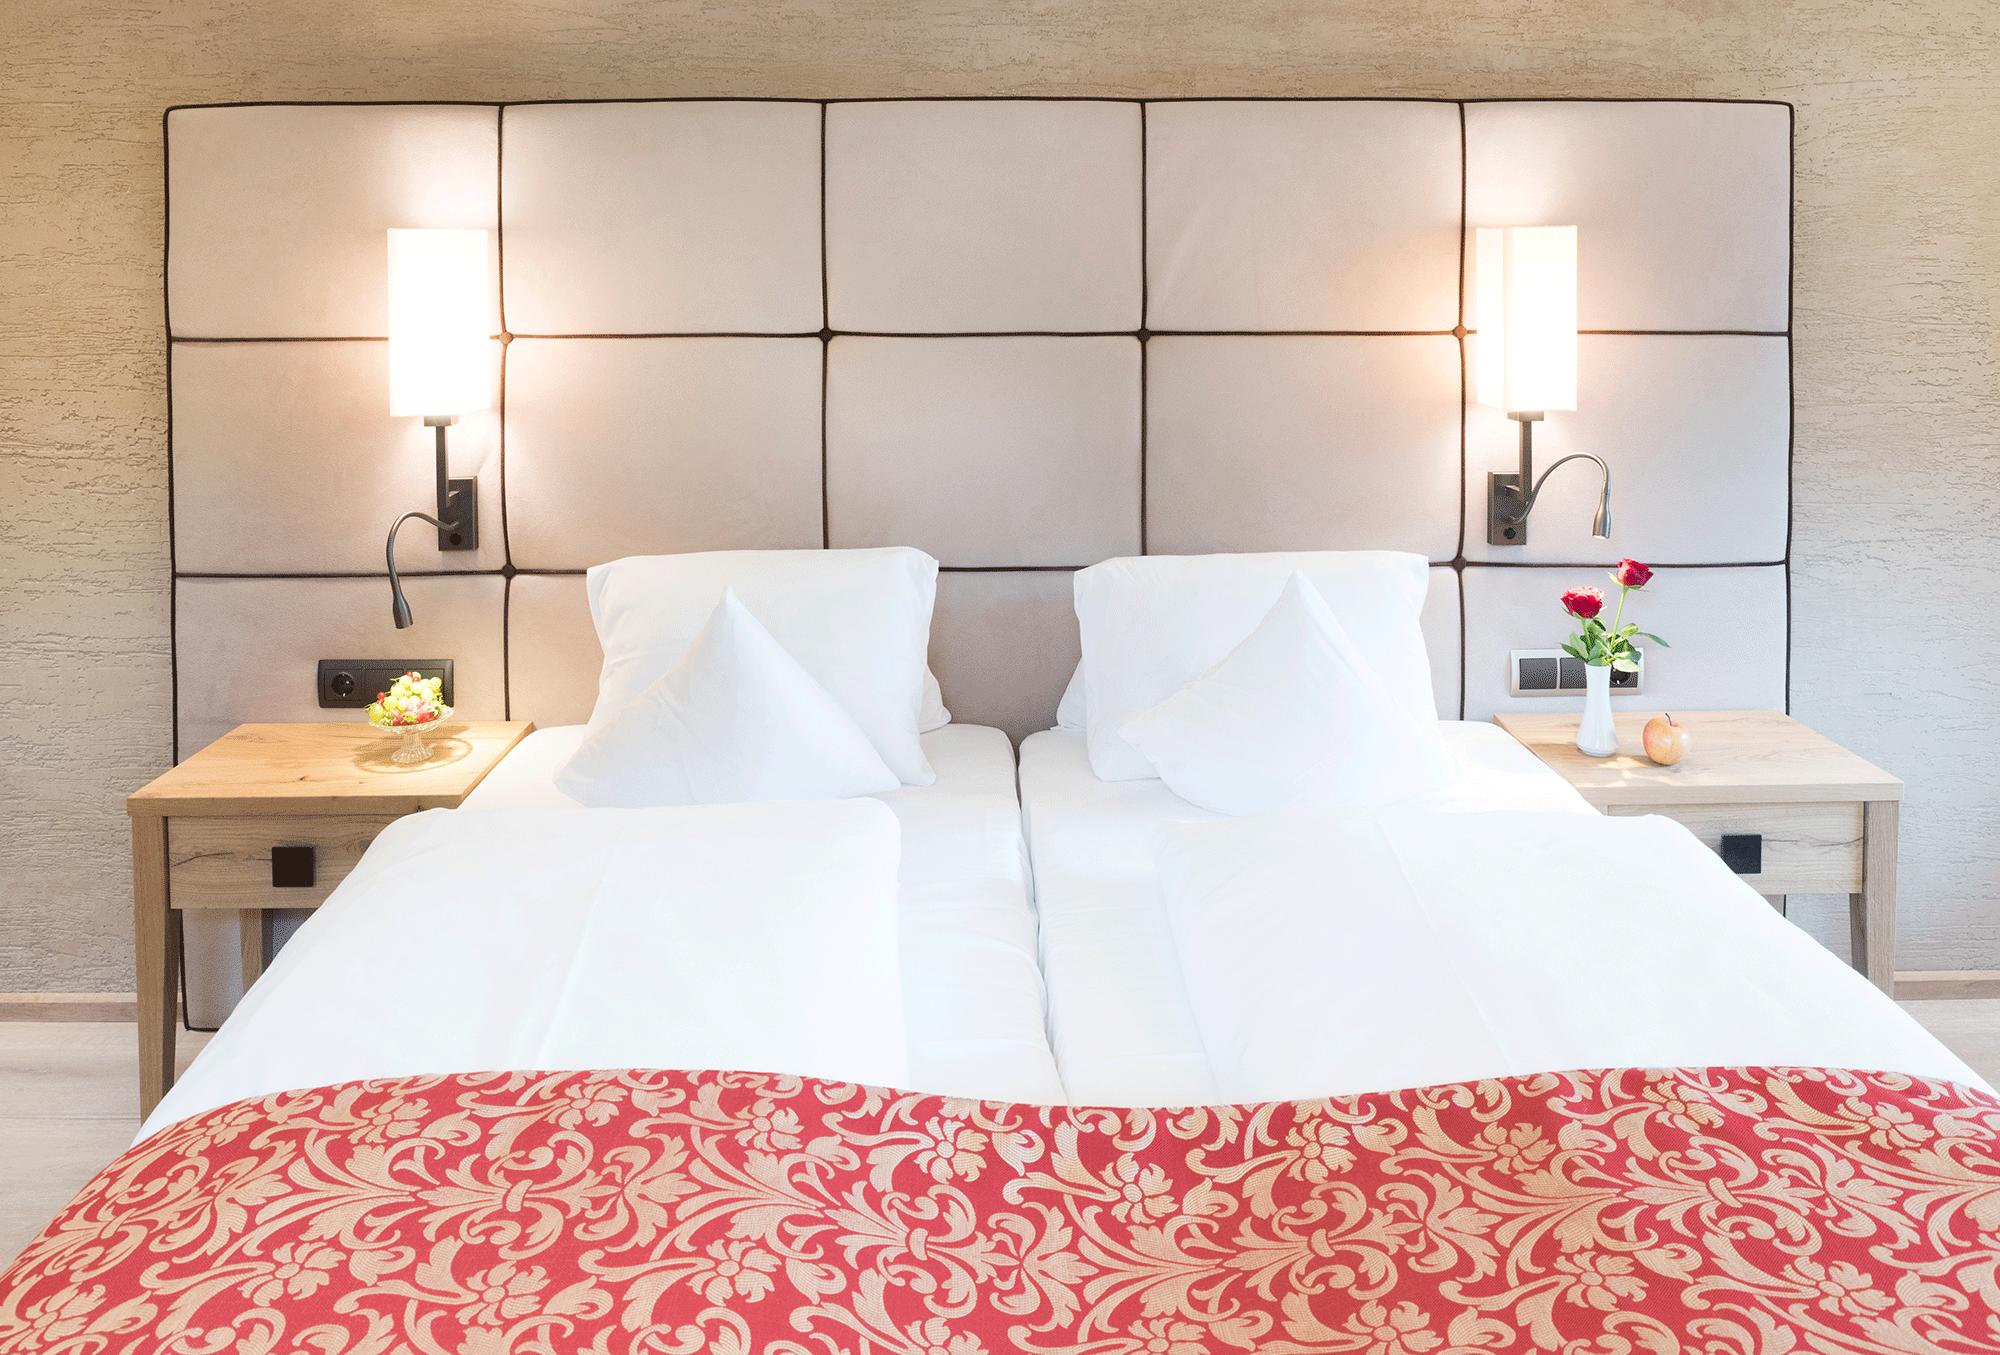 Wohnkomfortzimmer Alpbach Bett im Wellnesshotel Alpbacherhof in Tirol